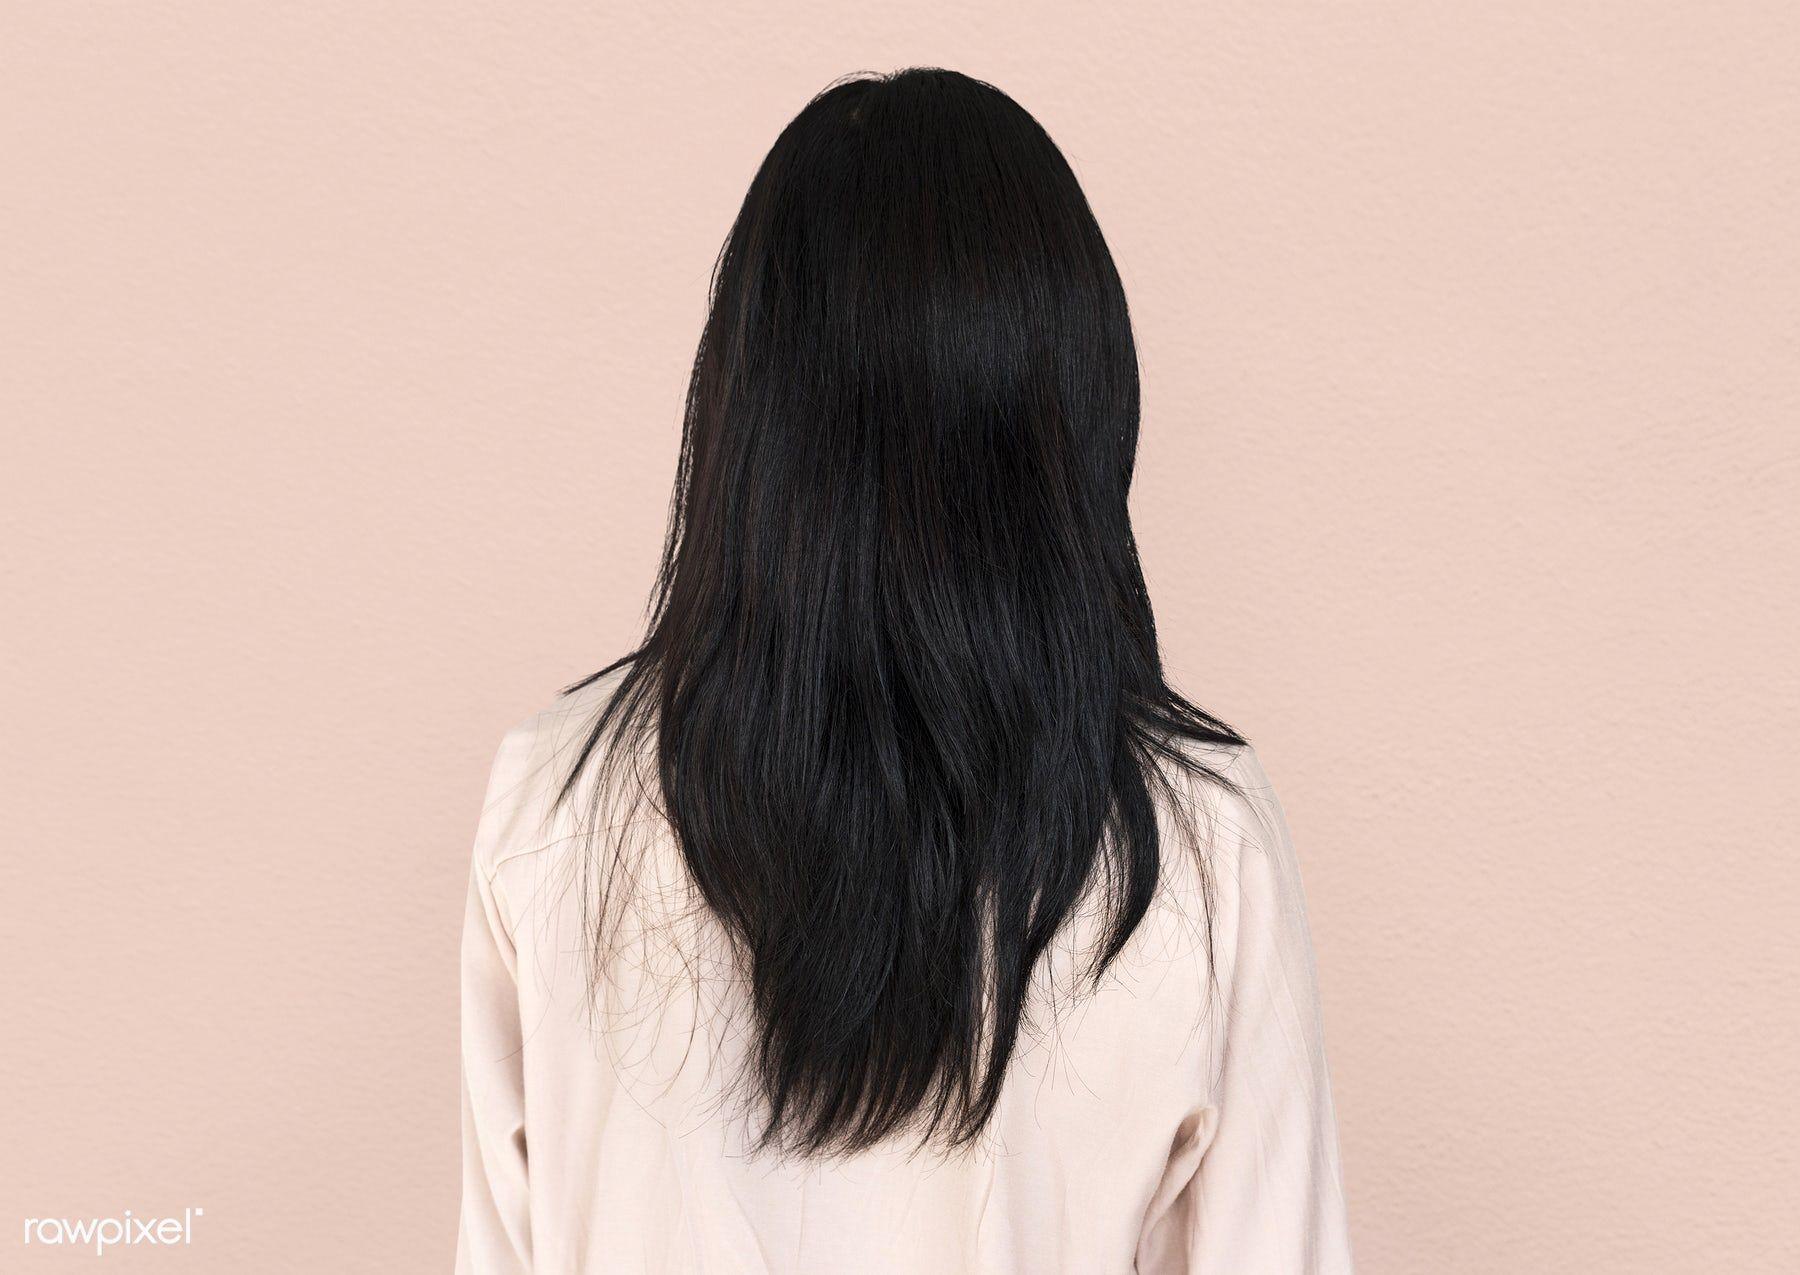 Download Premium Image Of Rear View Of Woman Showing Her Long Black Hair Long Black Hair Hair Premium Hair Hacks